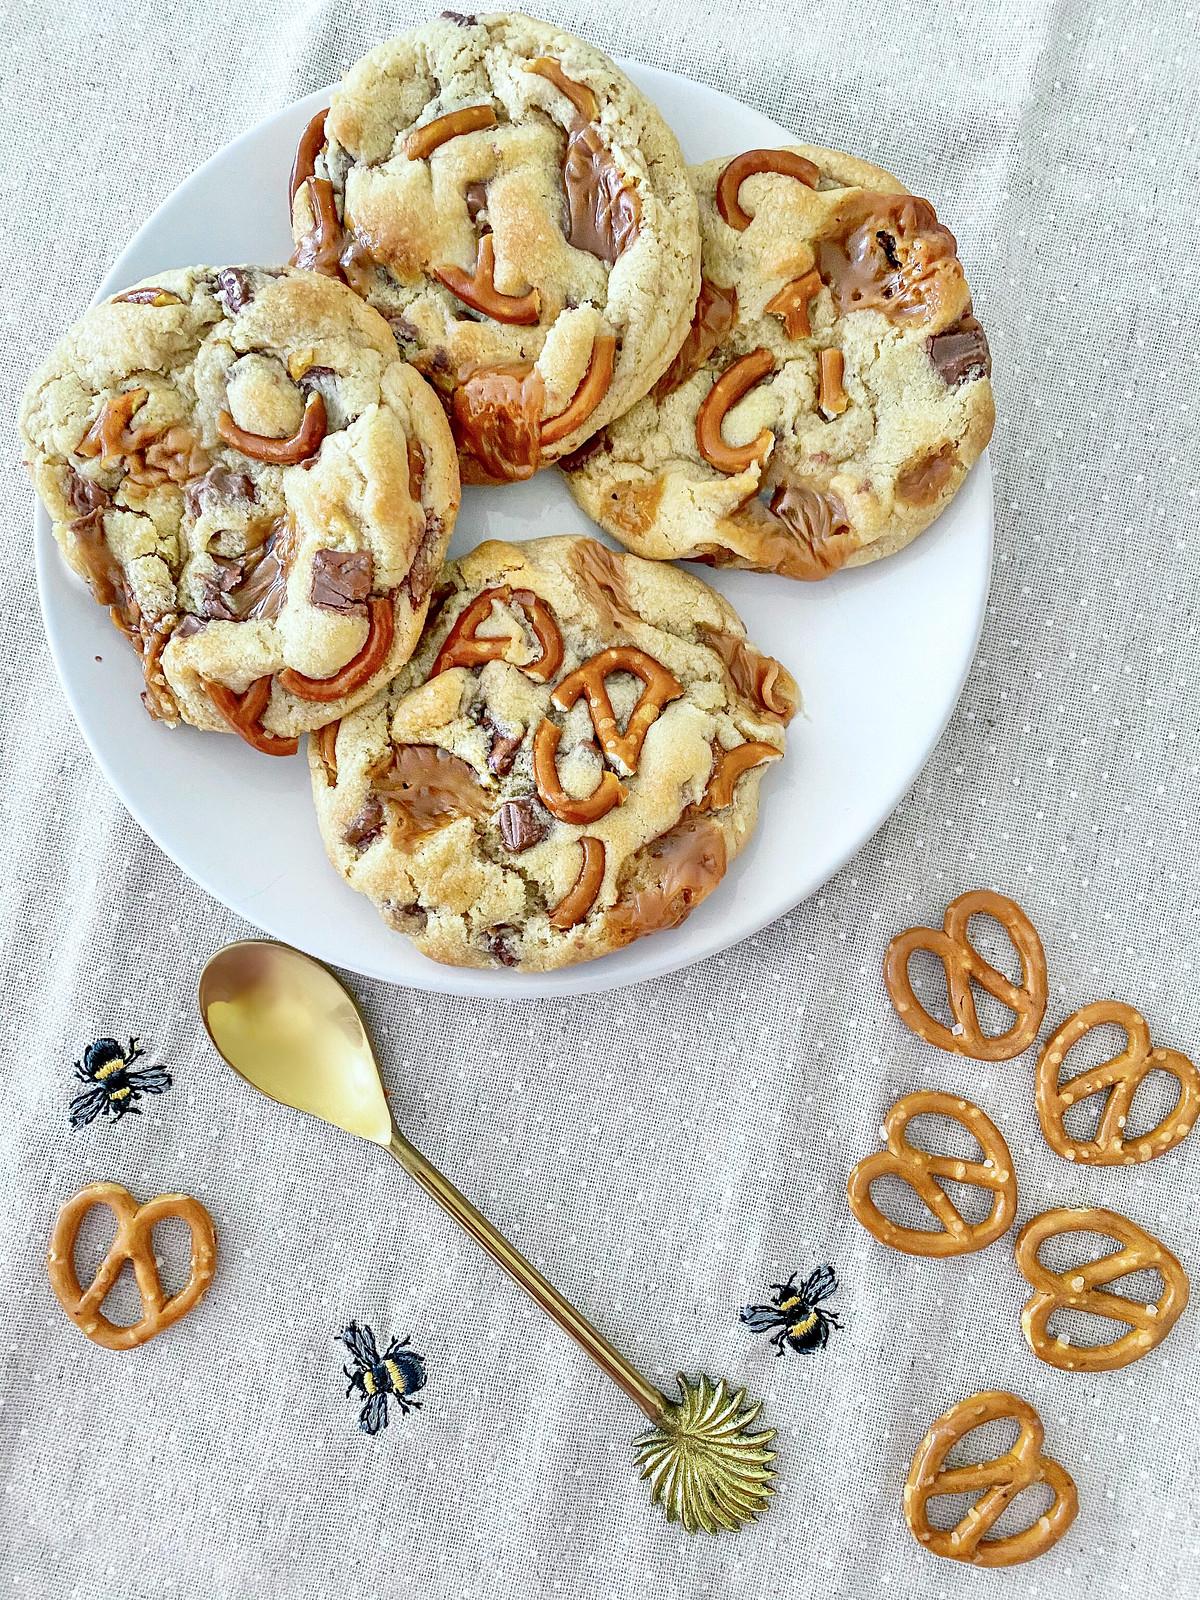 Salted caramel and pretzel cookies